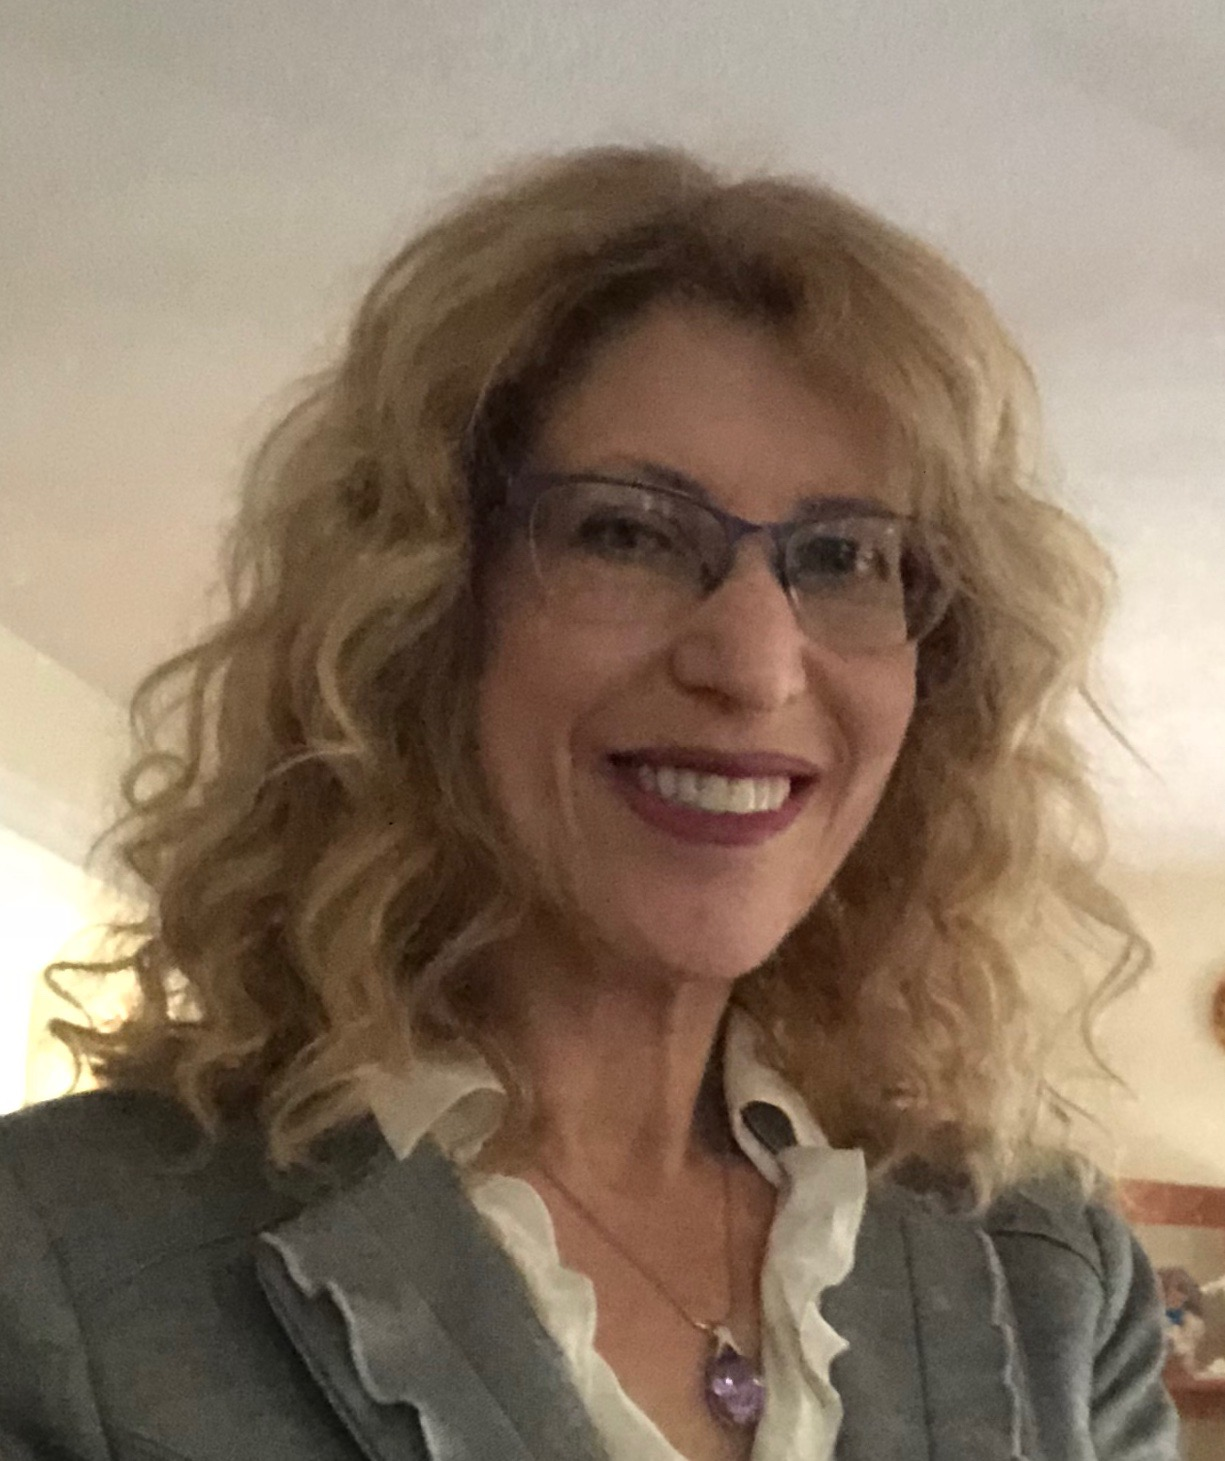 Lexington - Dr. Carolyn Schweitzer photo.jpg